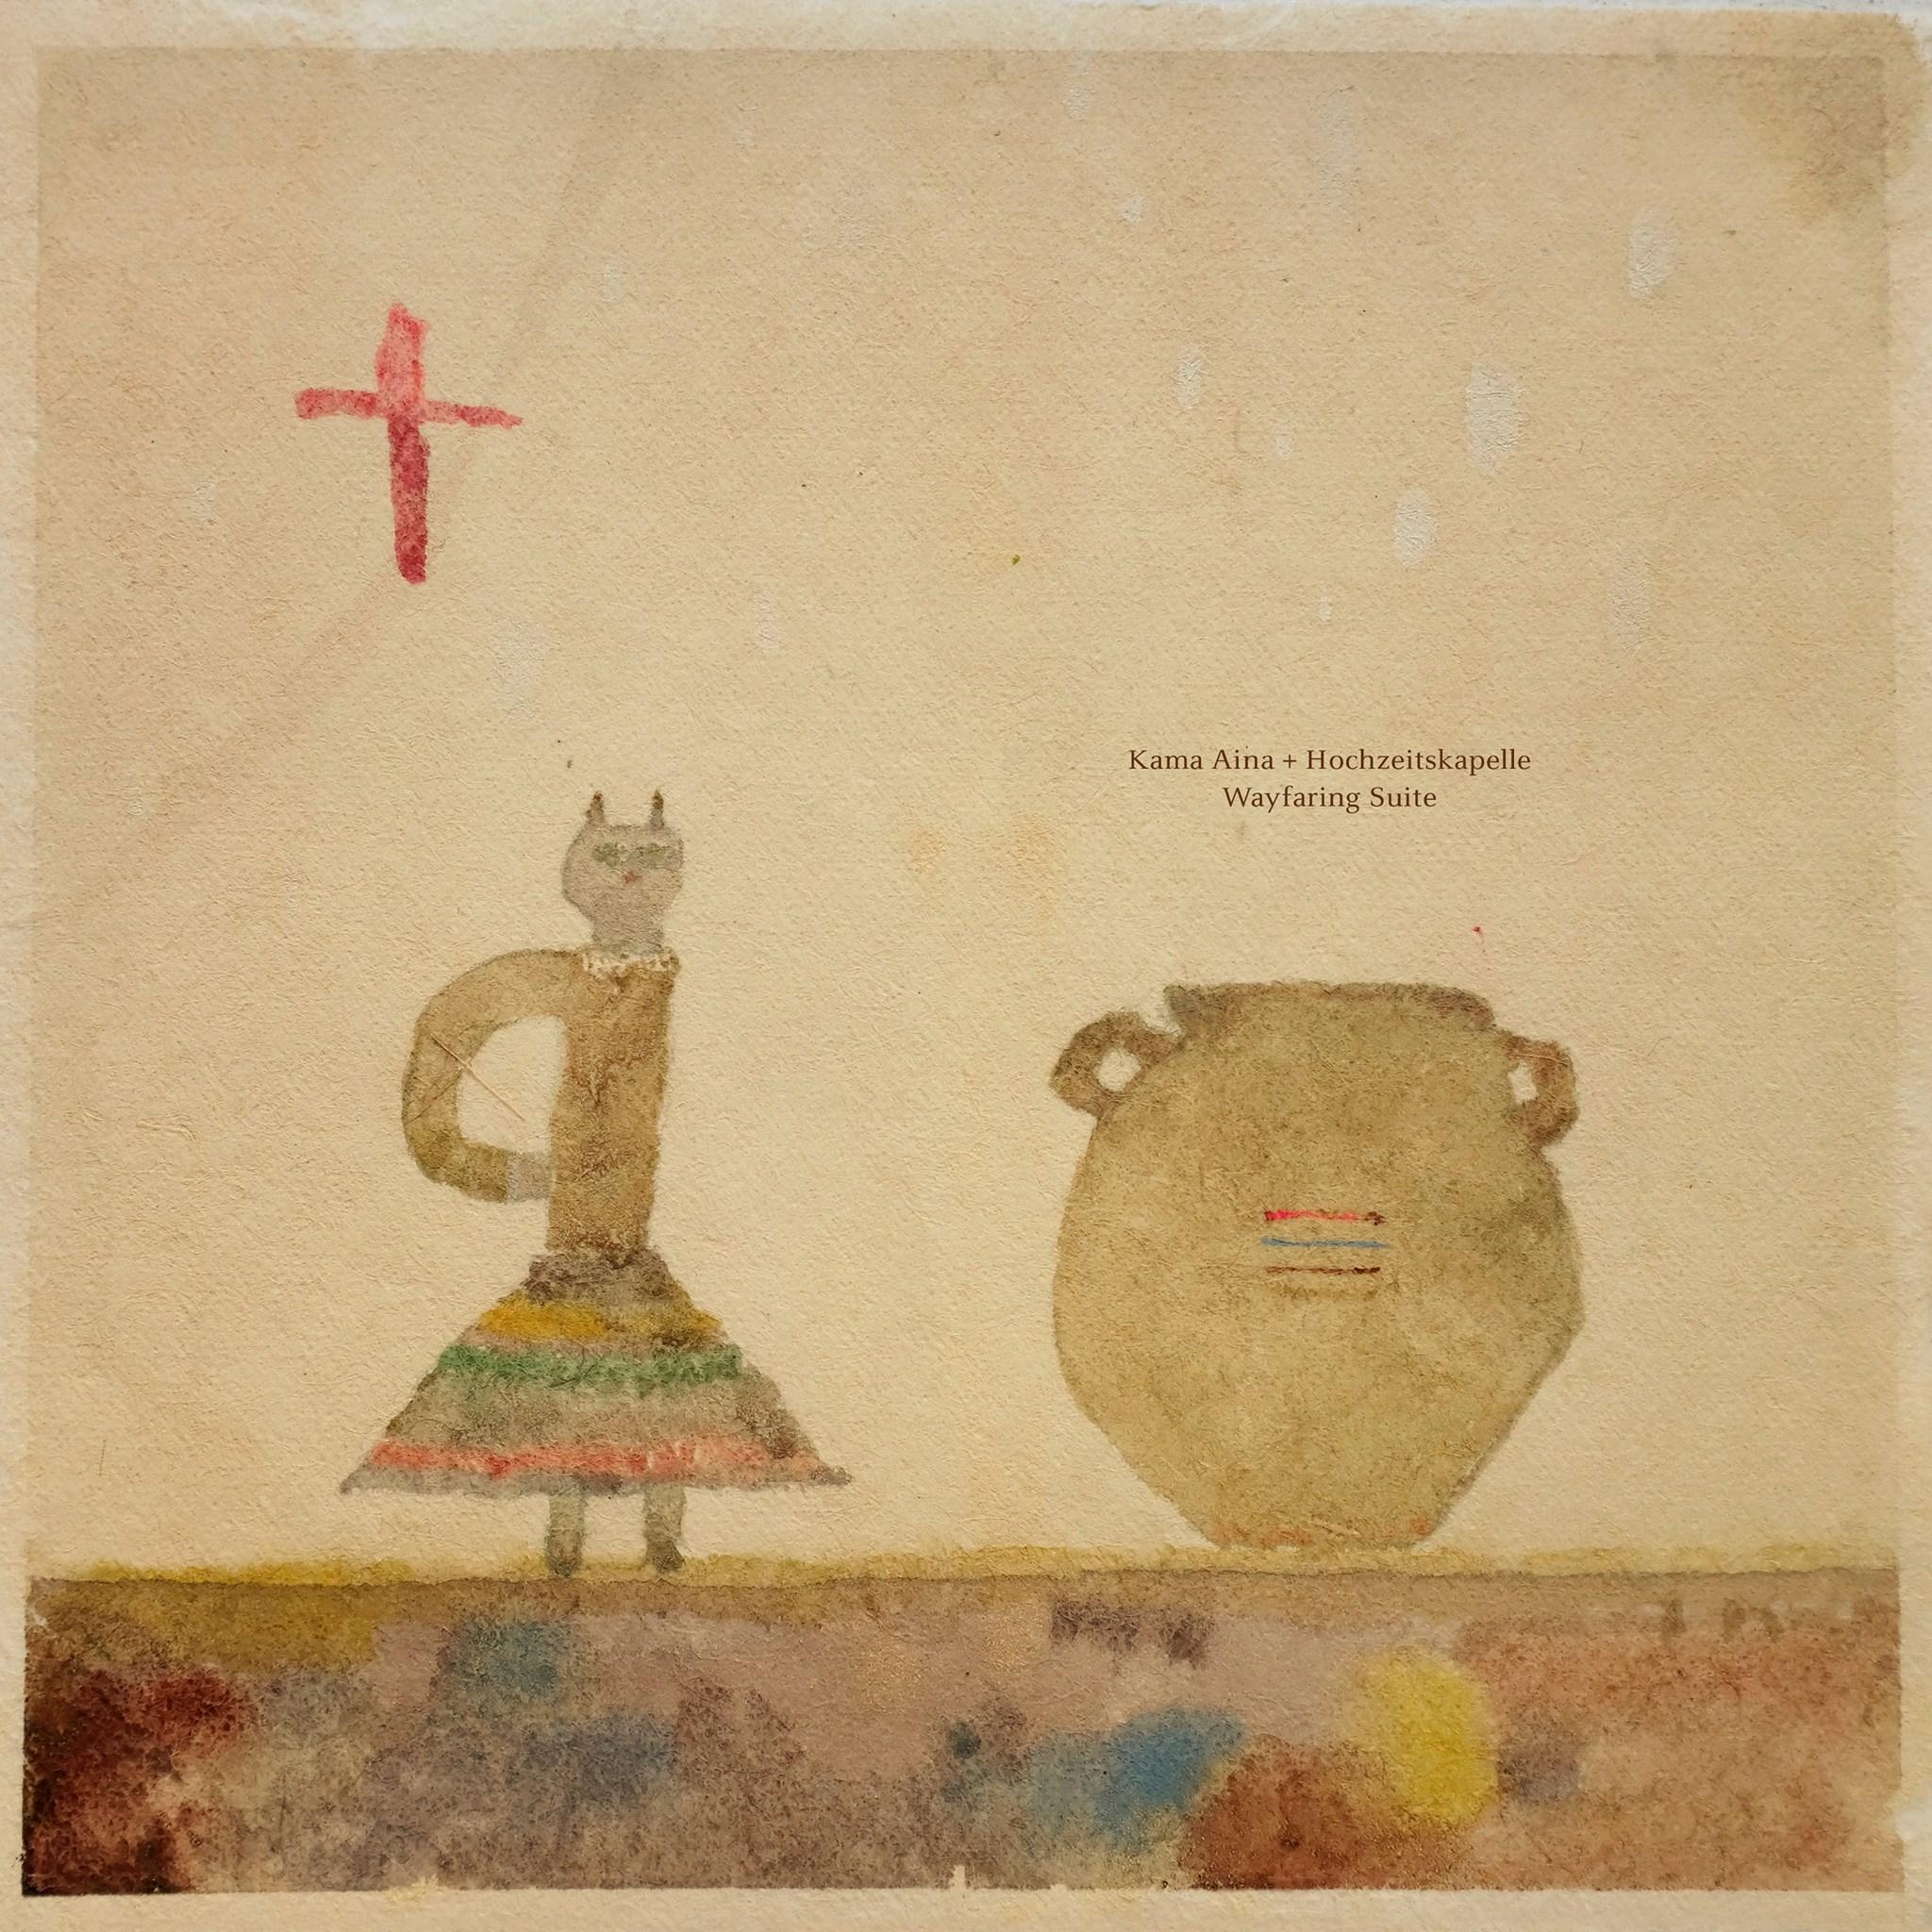 Hochzeit Kapelle/Kama Aina - Wayfaring Suite 6 - fanzine